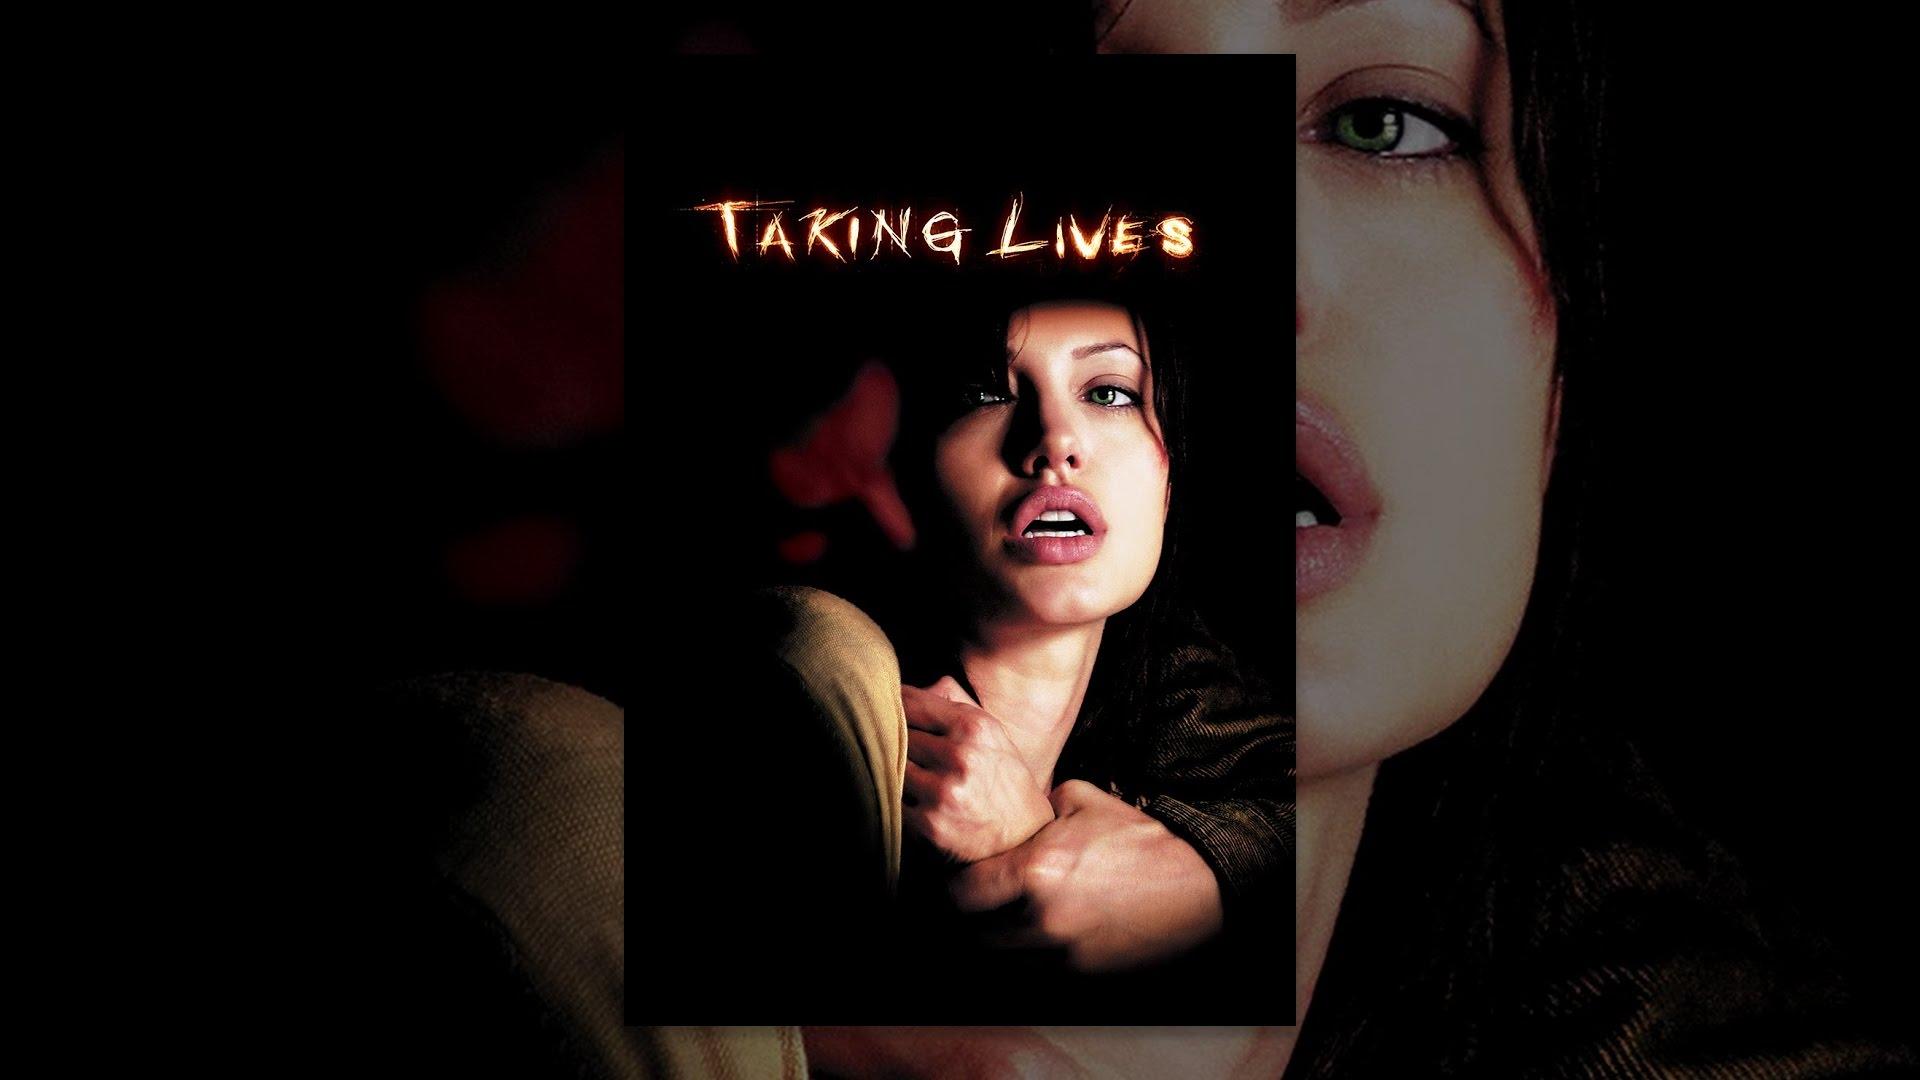 Taking Lives - YouTube